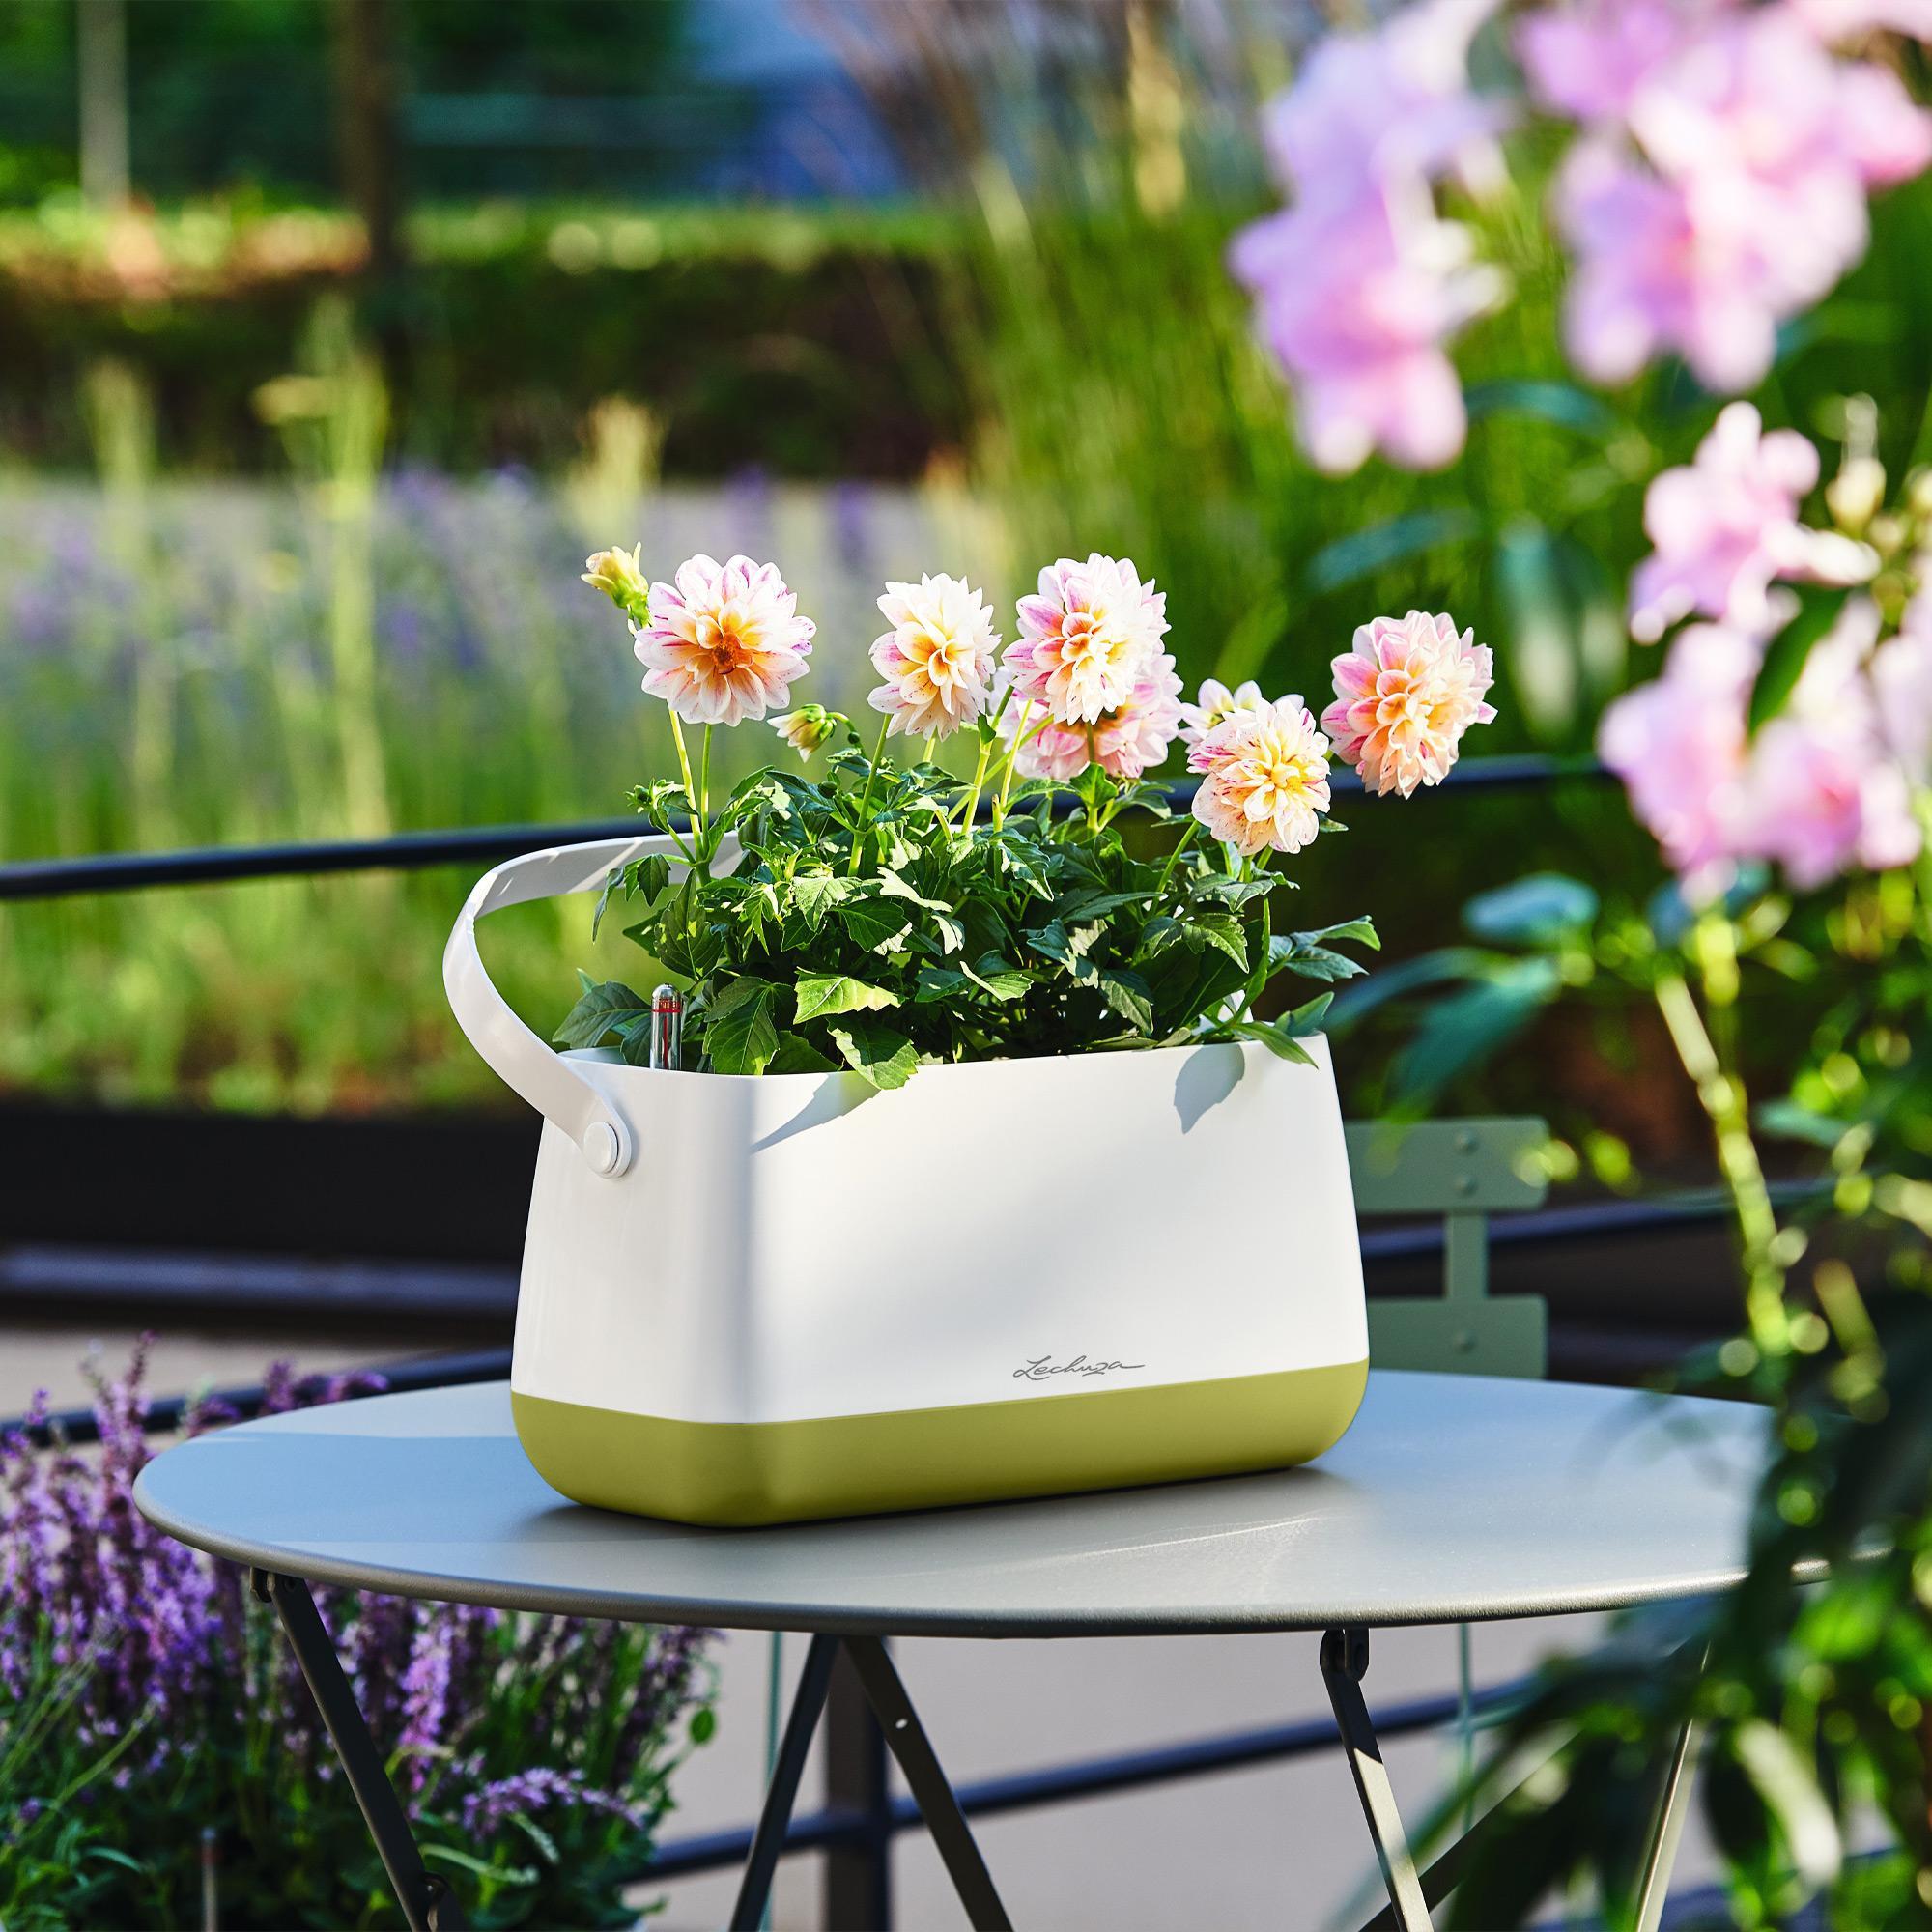 YULA plant bag white/gray semi-gloss - Image 8